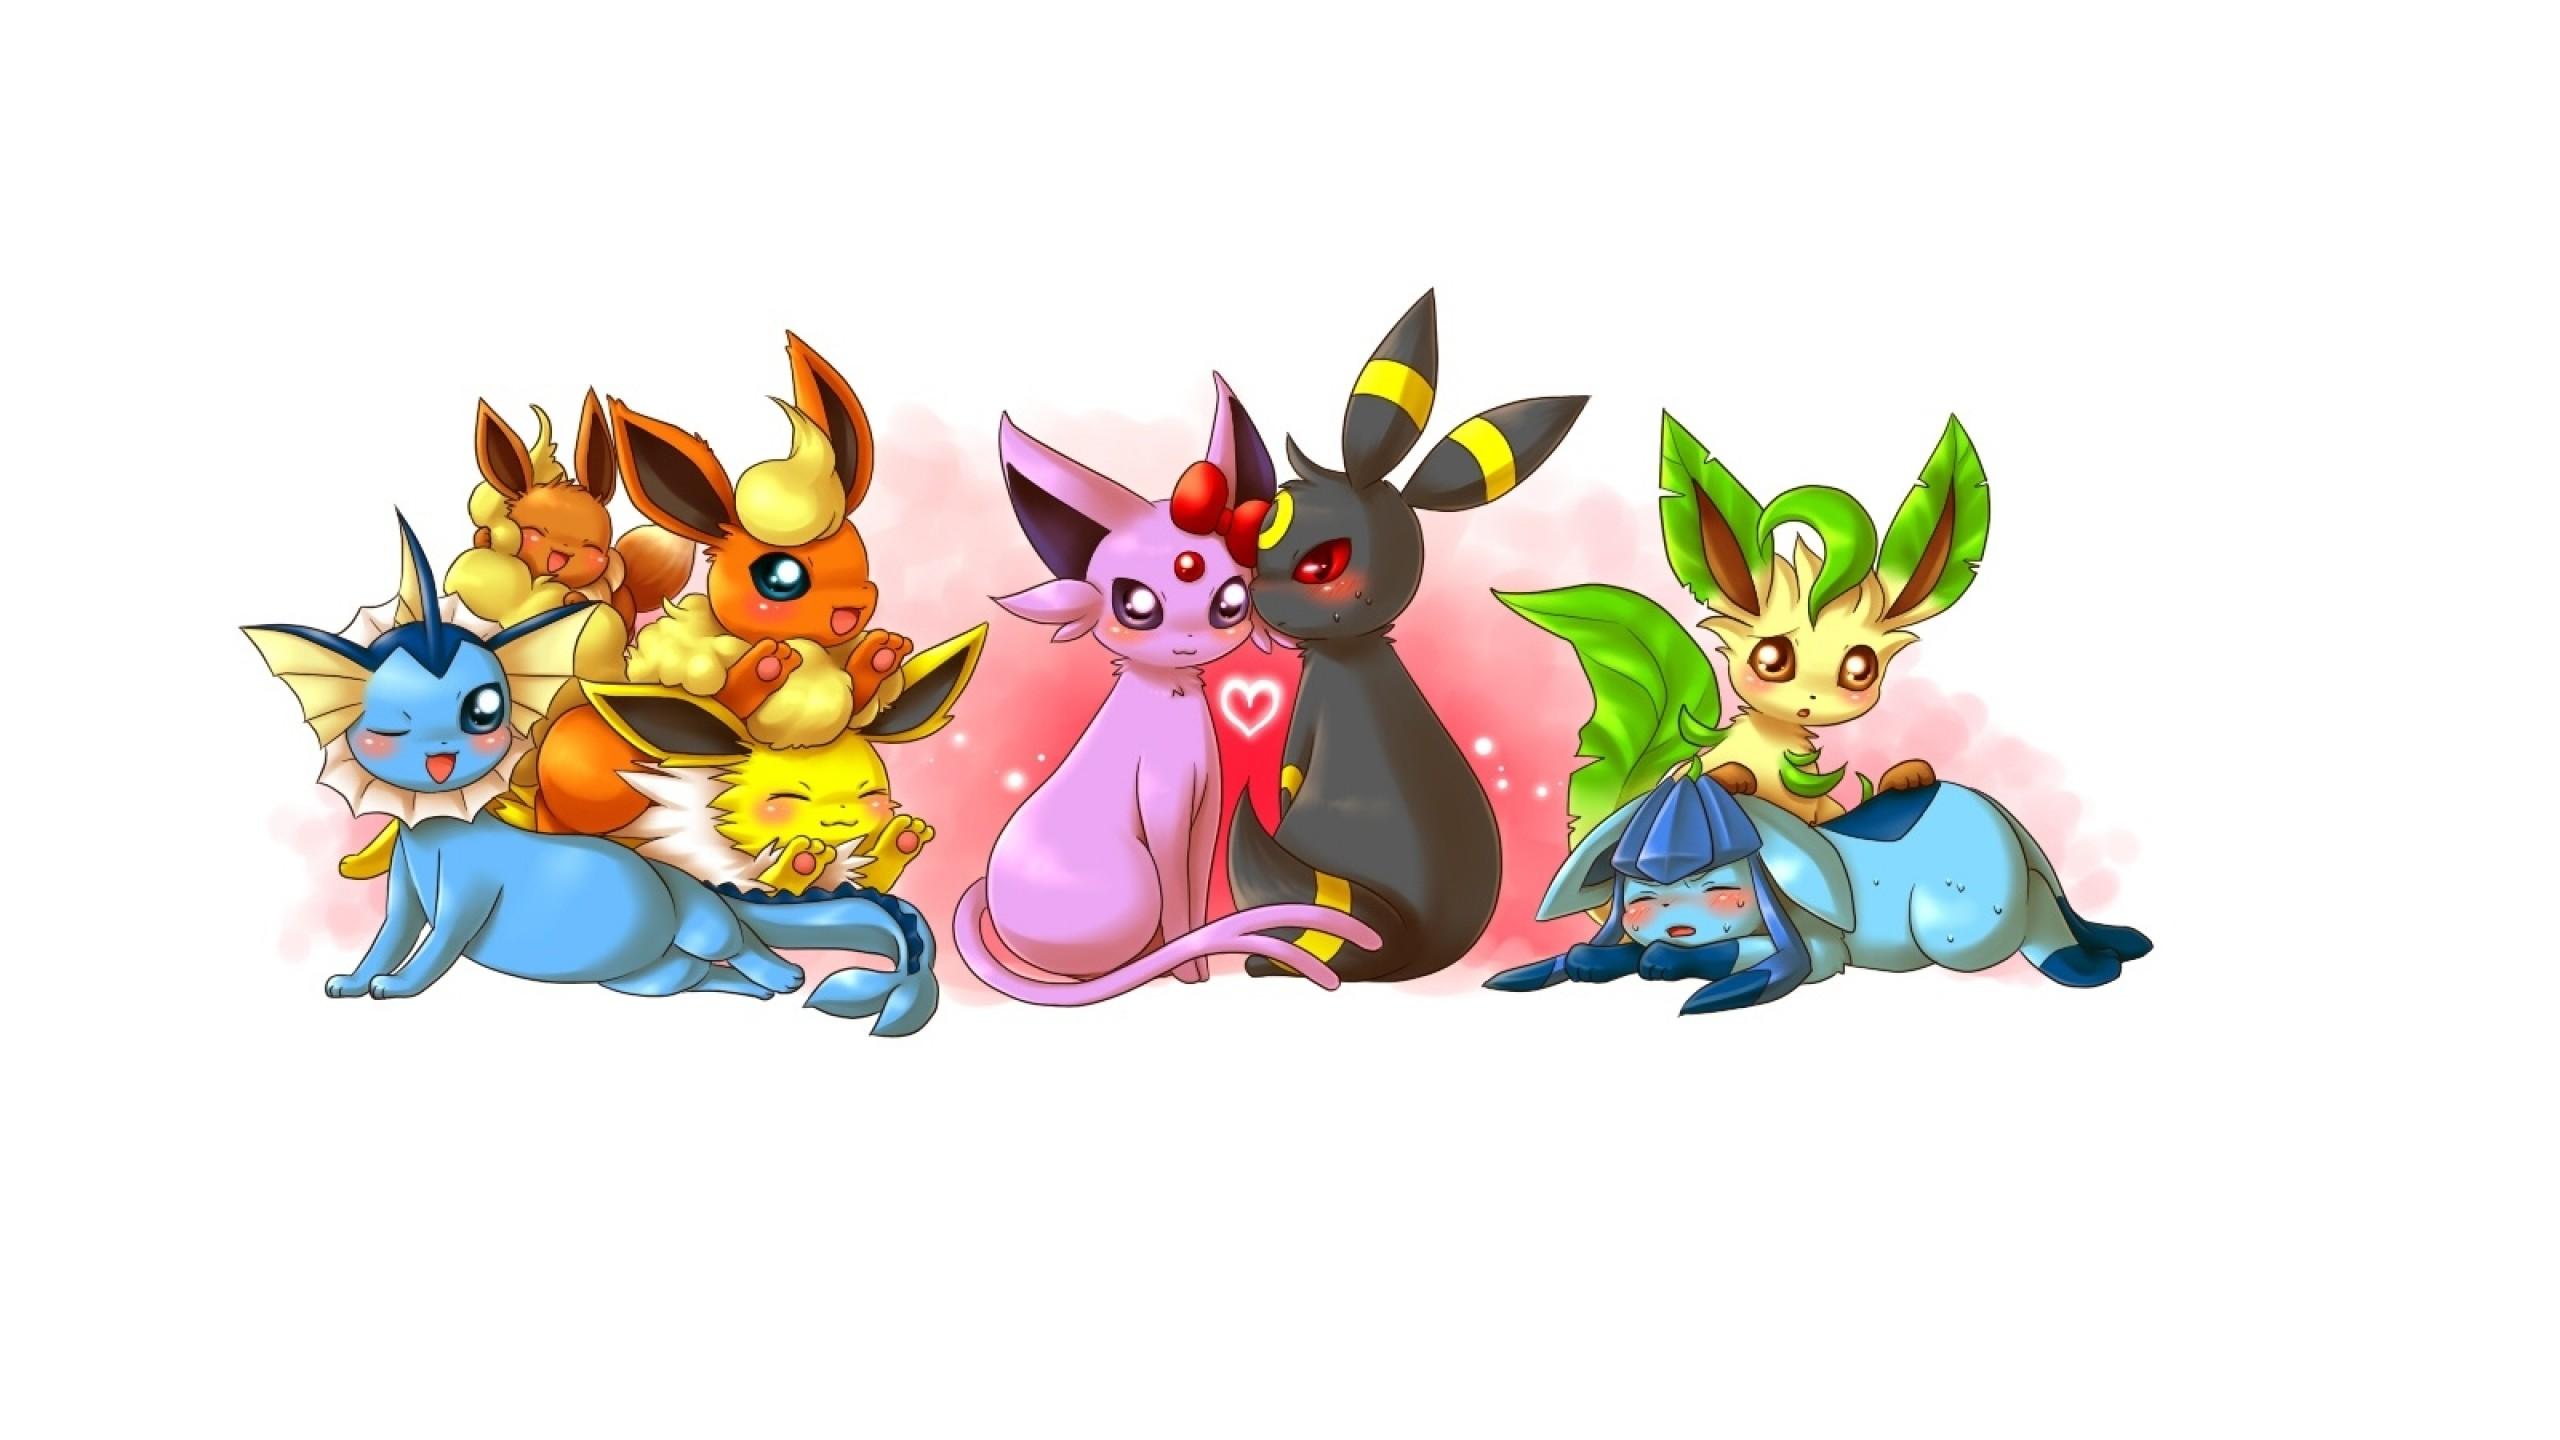 Pokemon Pokemon Wallpaper Groudon Gallery. Download 2560×1440